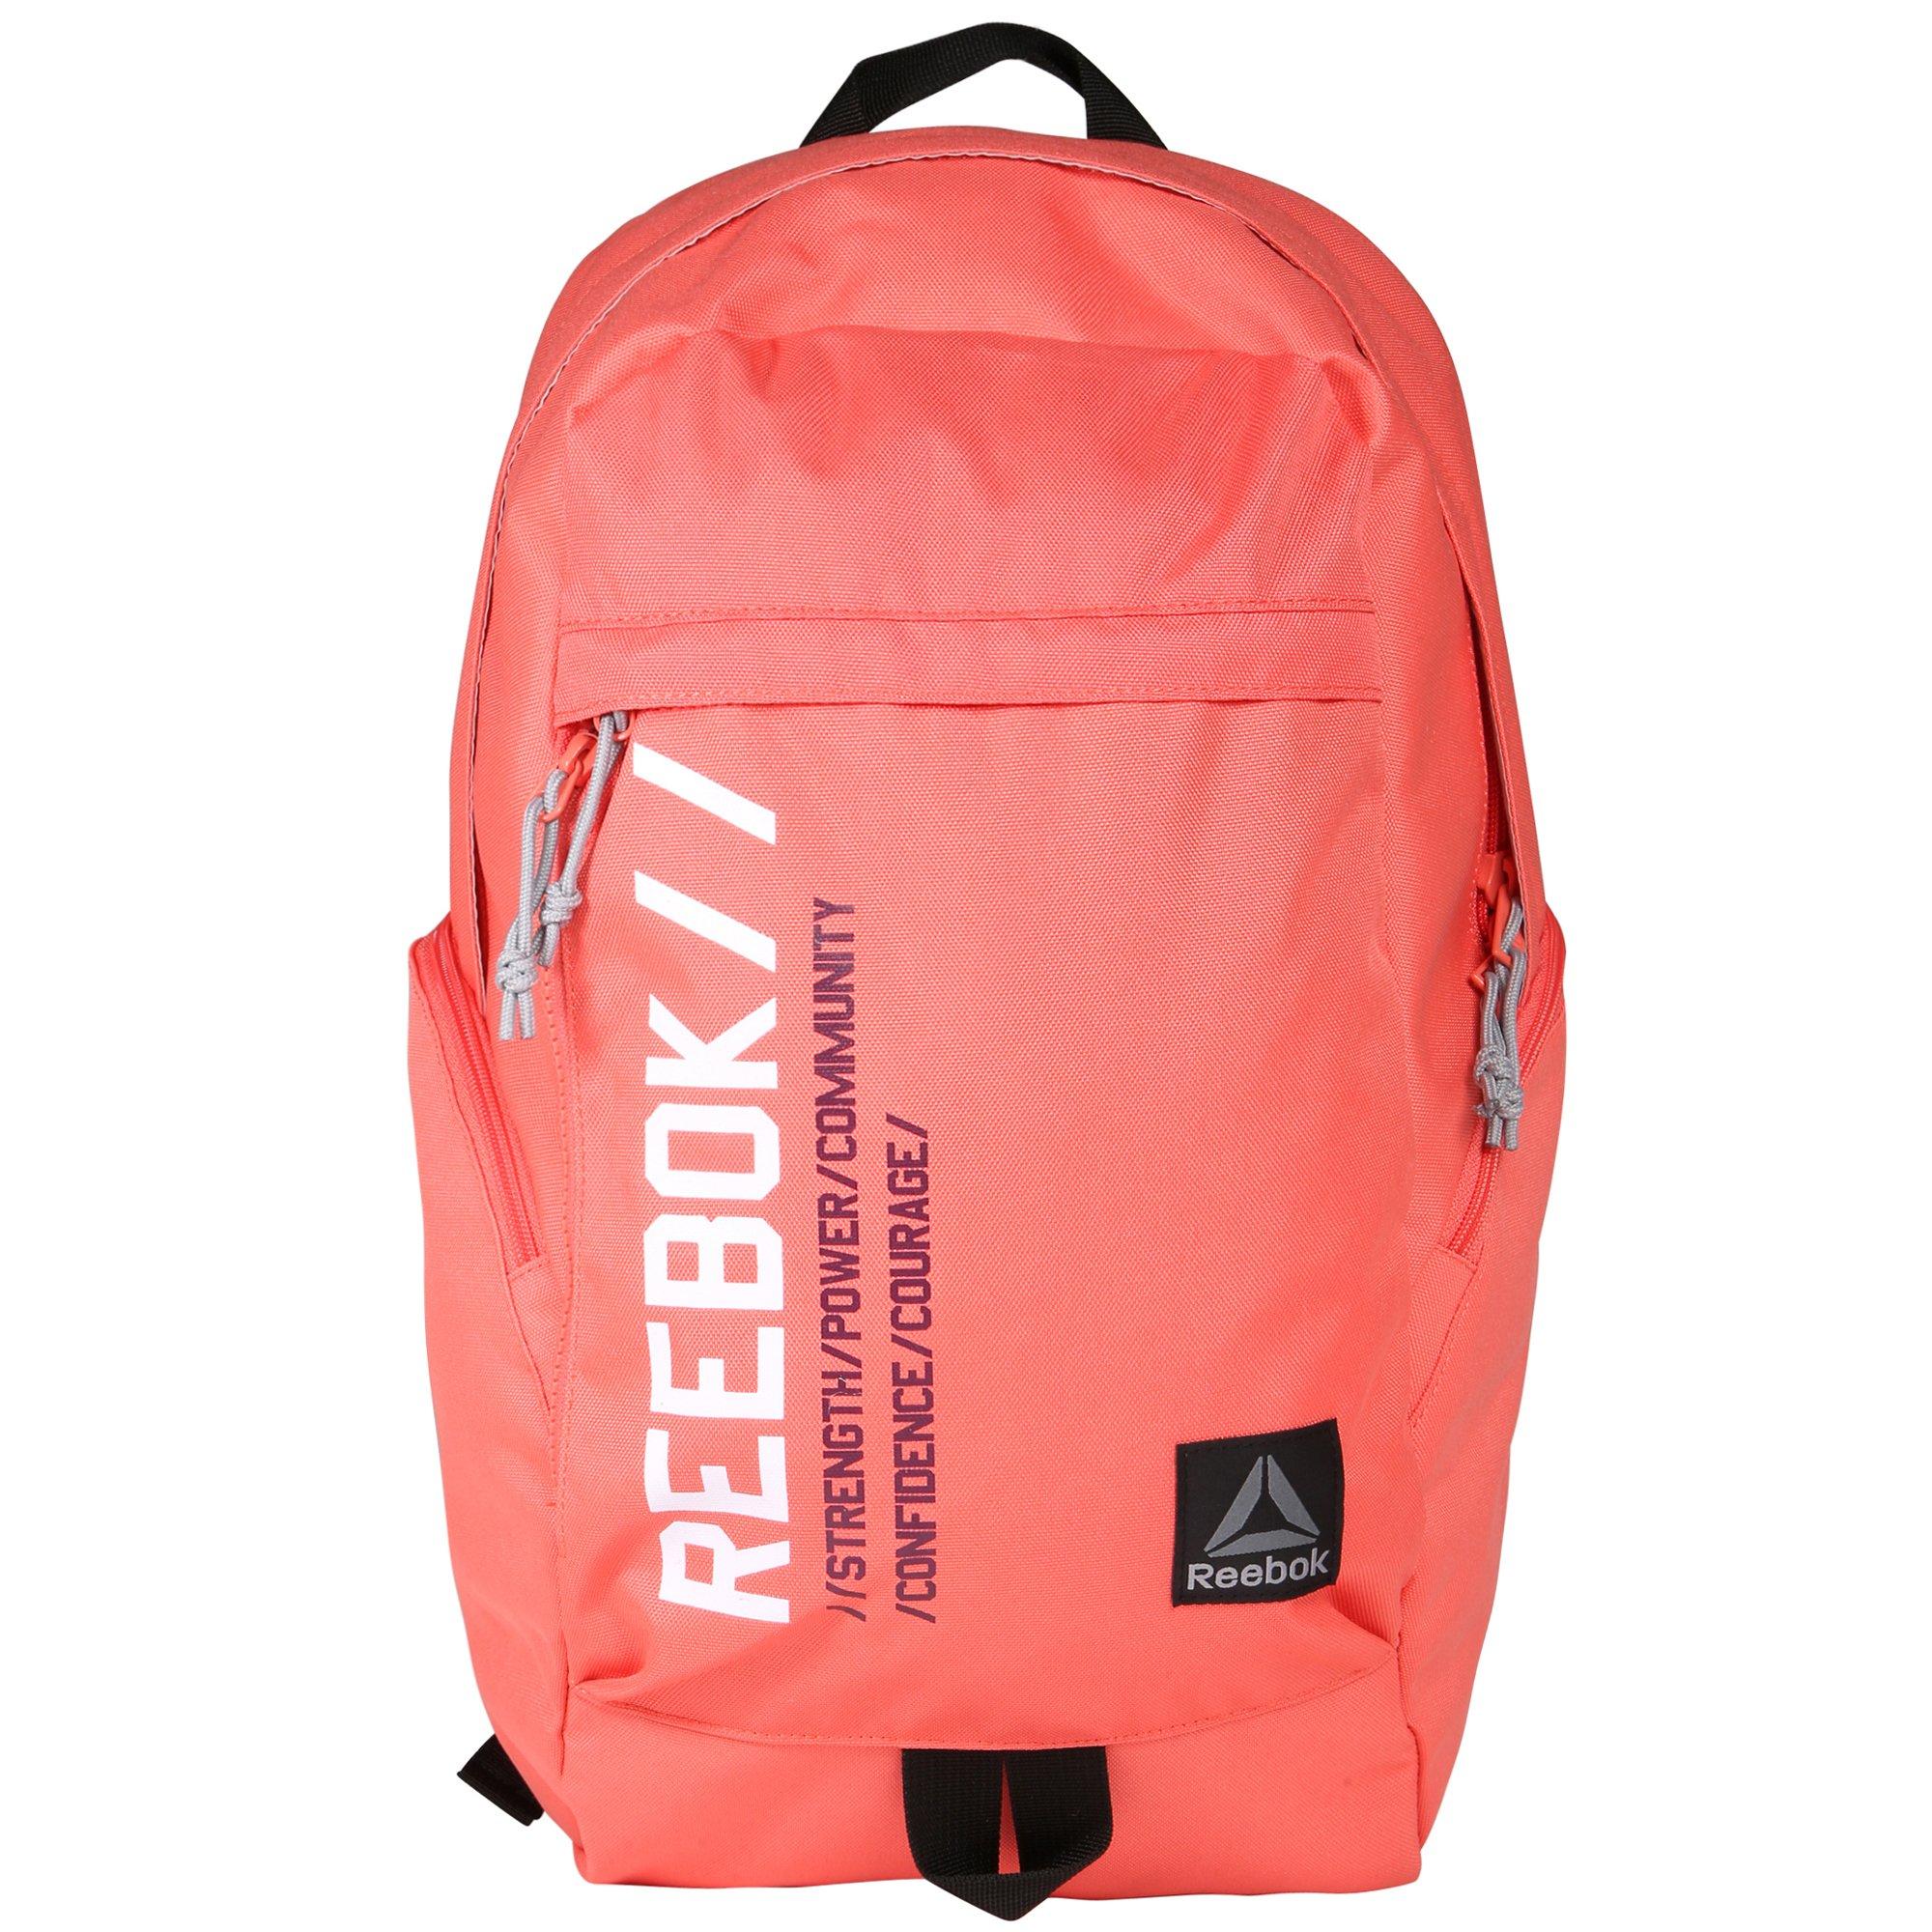 REEBOK Jungen Motion U Active Backpack Rucksack, Orange (Fircor), 45 x 24 x 15 c